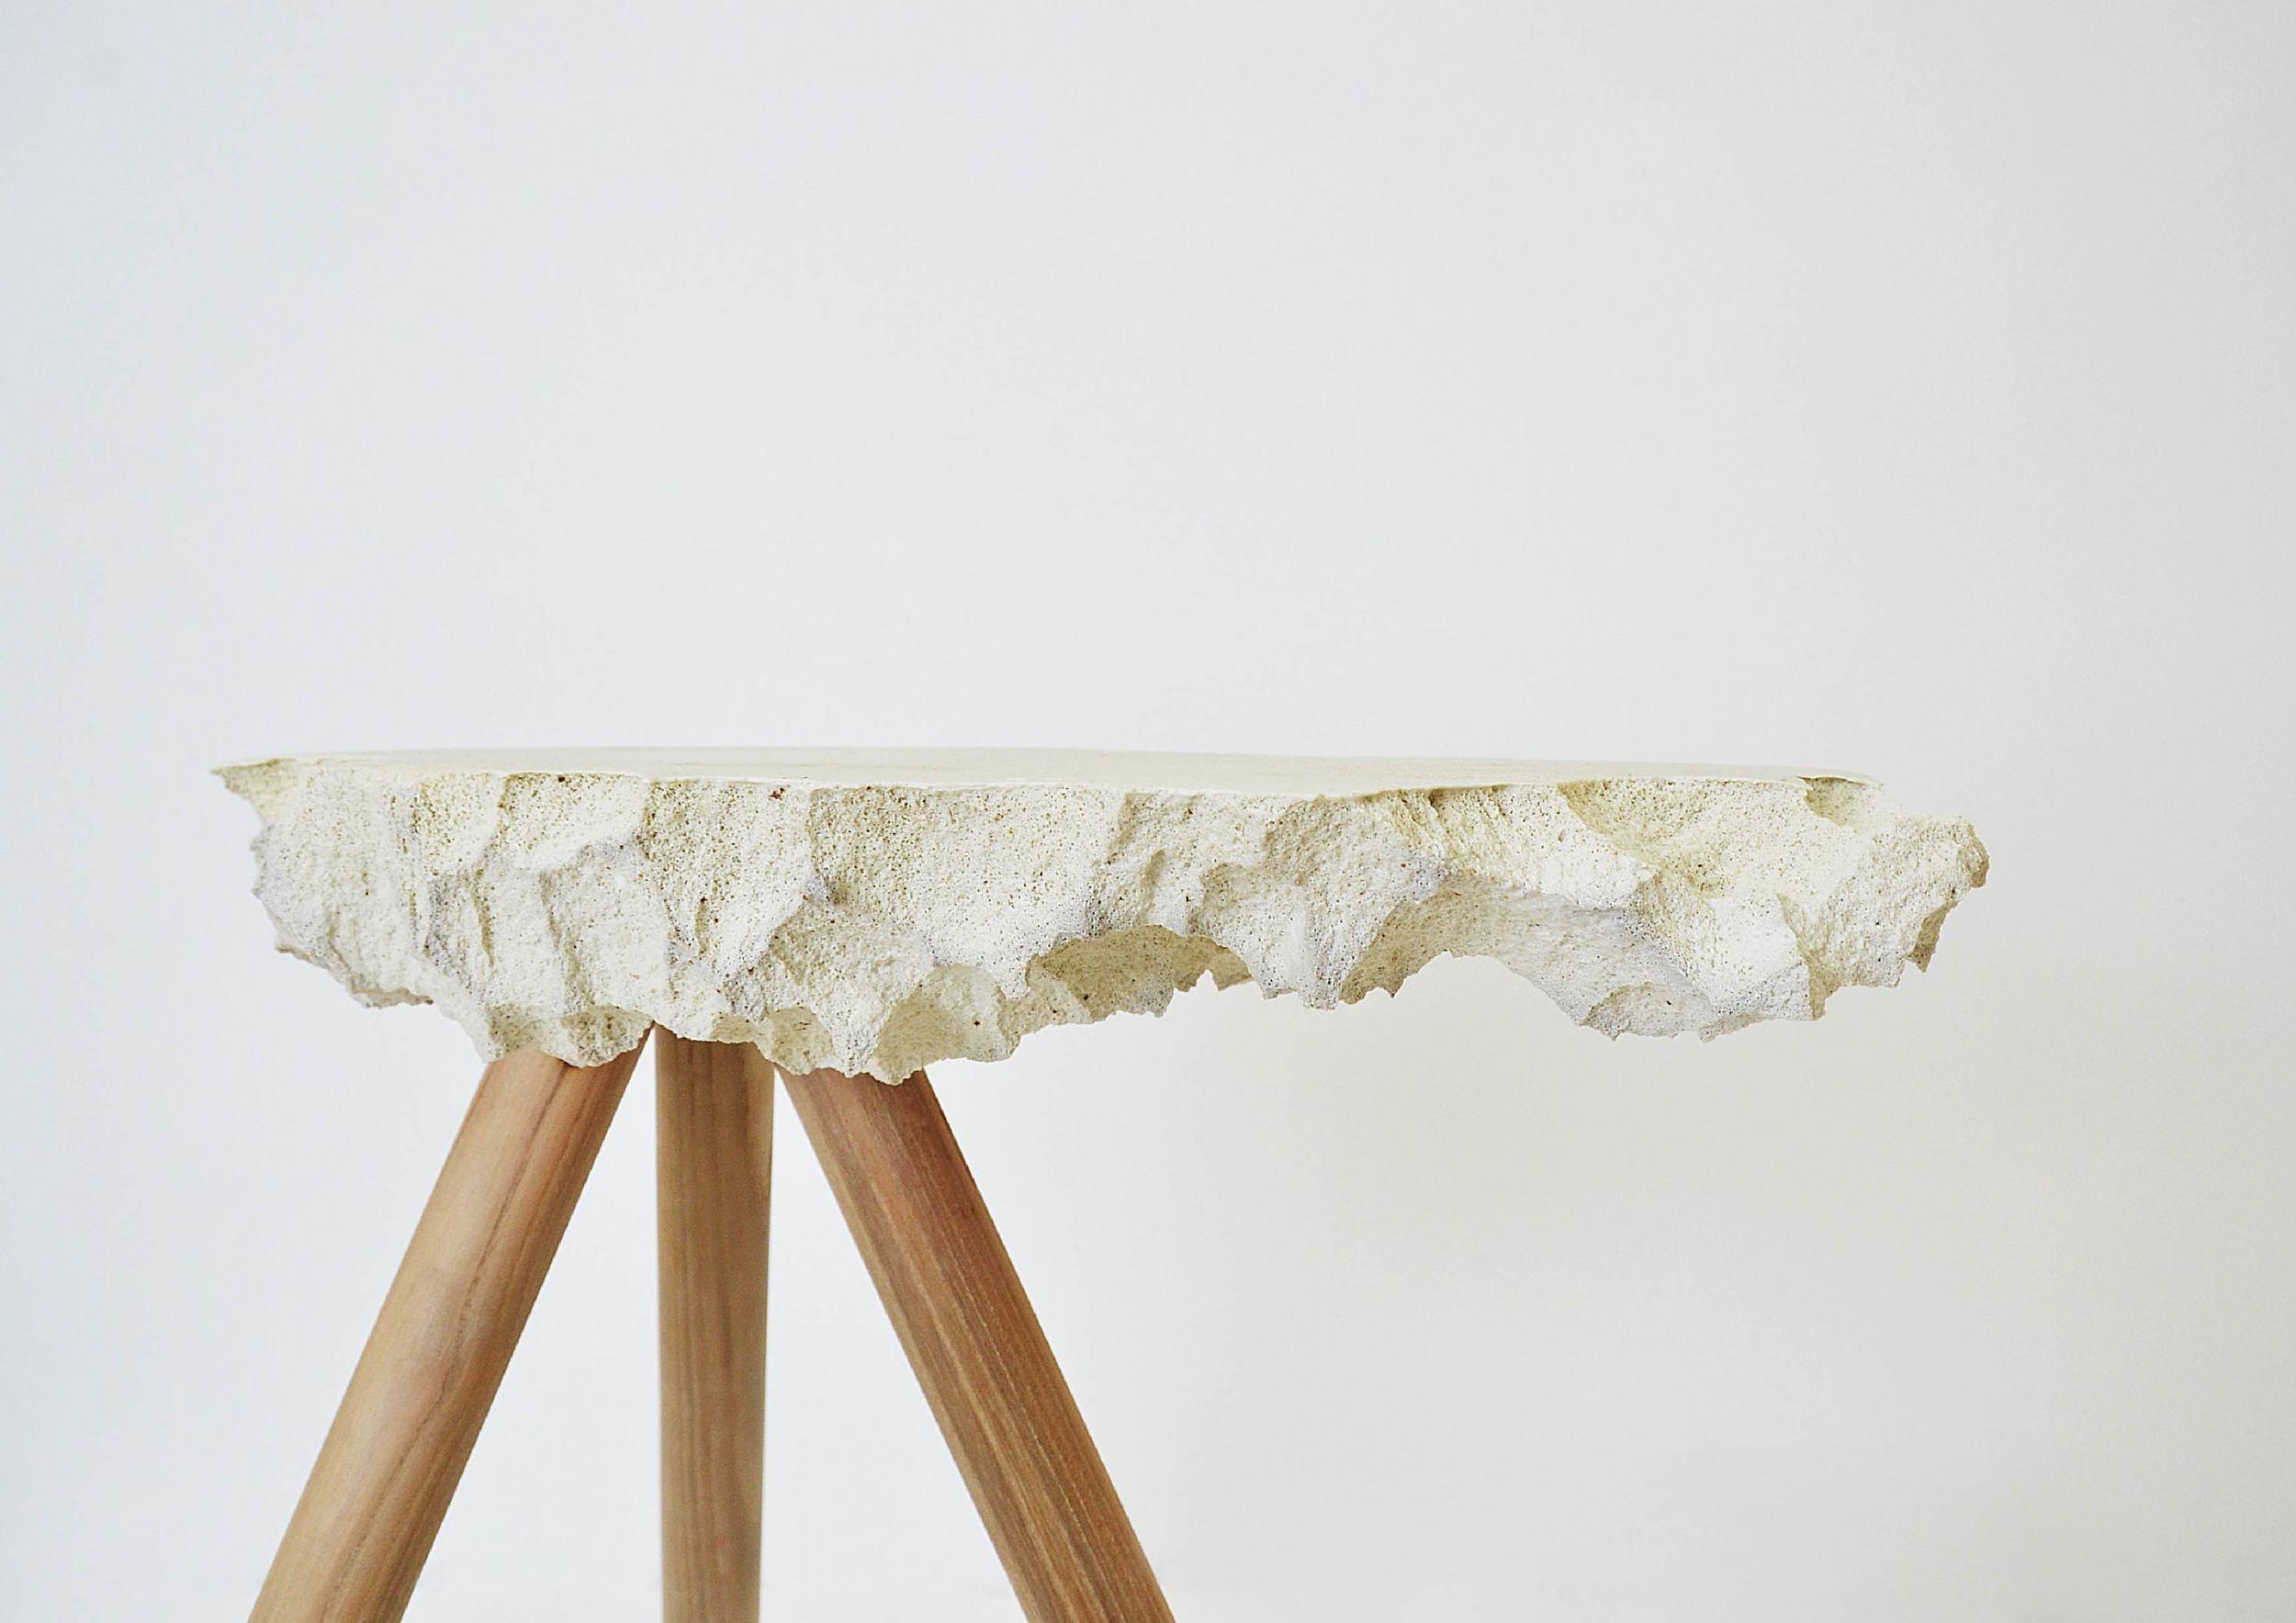 "Studio Work: PORCELAIN  I WHITE I   Size: 19"" x 20"" x 10""   Material: Porcelain, Oak   Photo by Luke Chen"